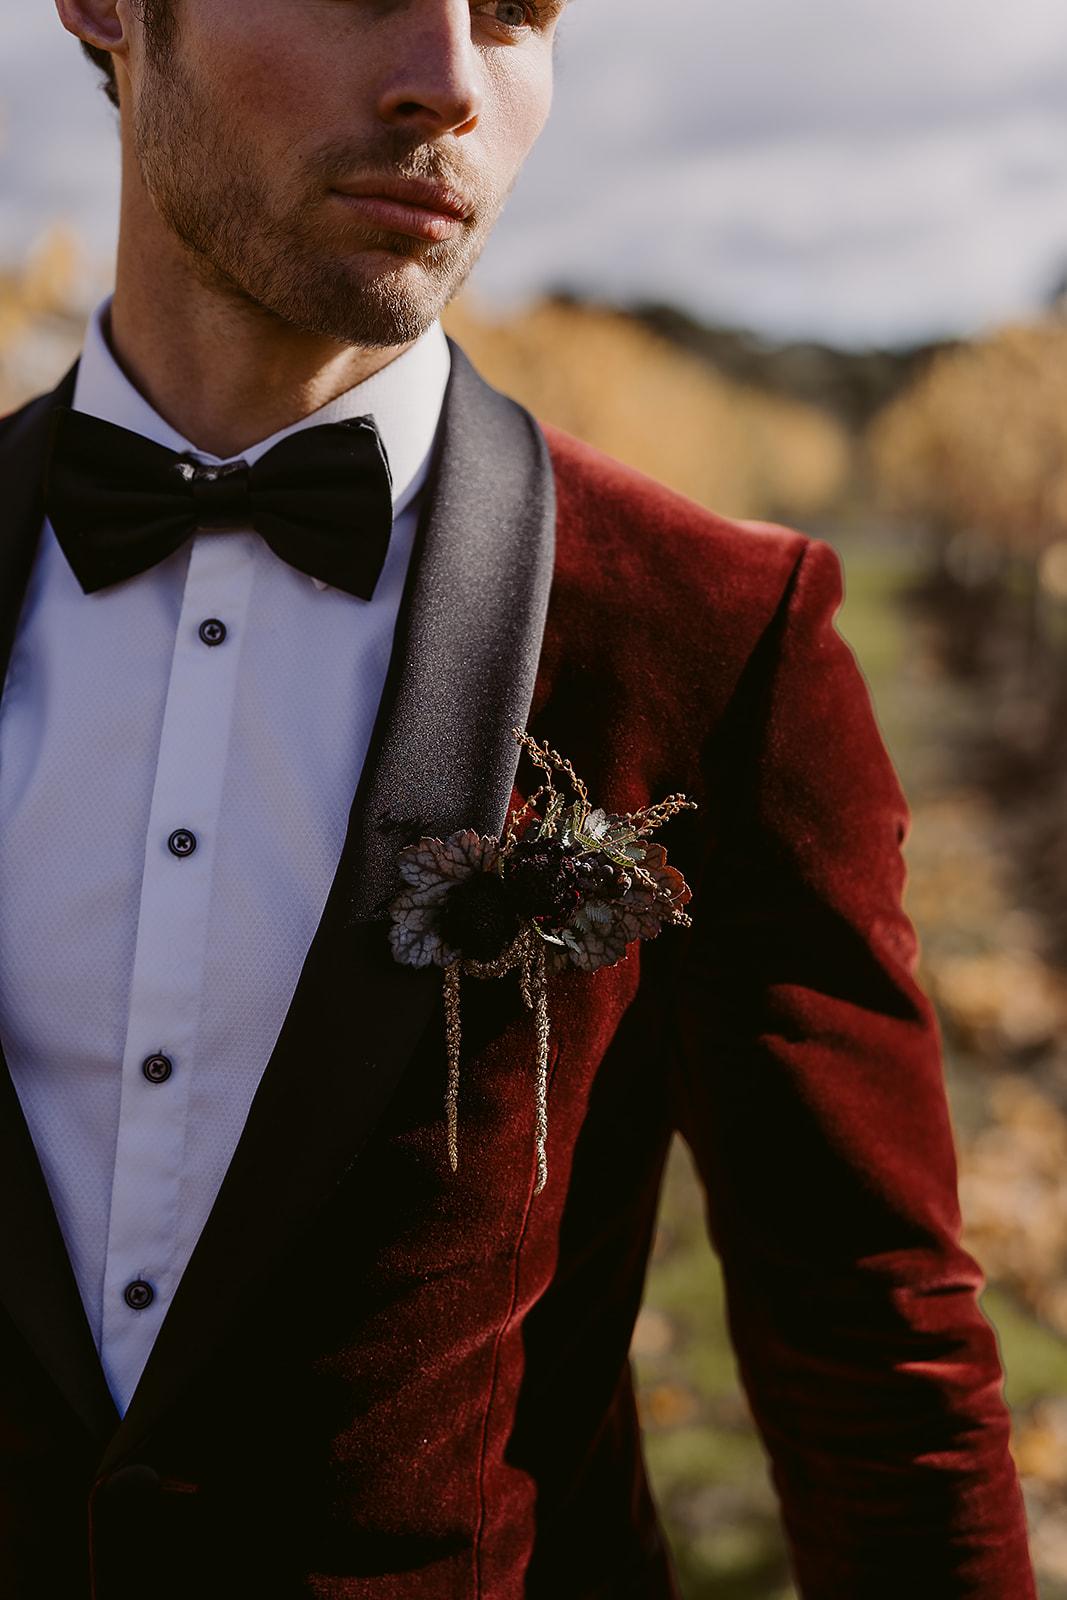 Immerse_Yarra_Valley_Same_Sex_Wedding_-_Ashleigh_Haase_Photography-314.jpg